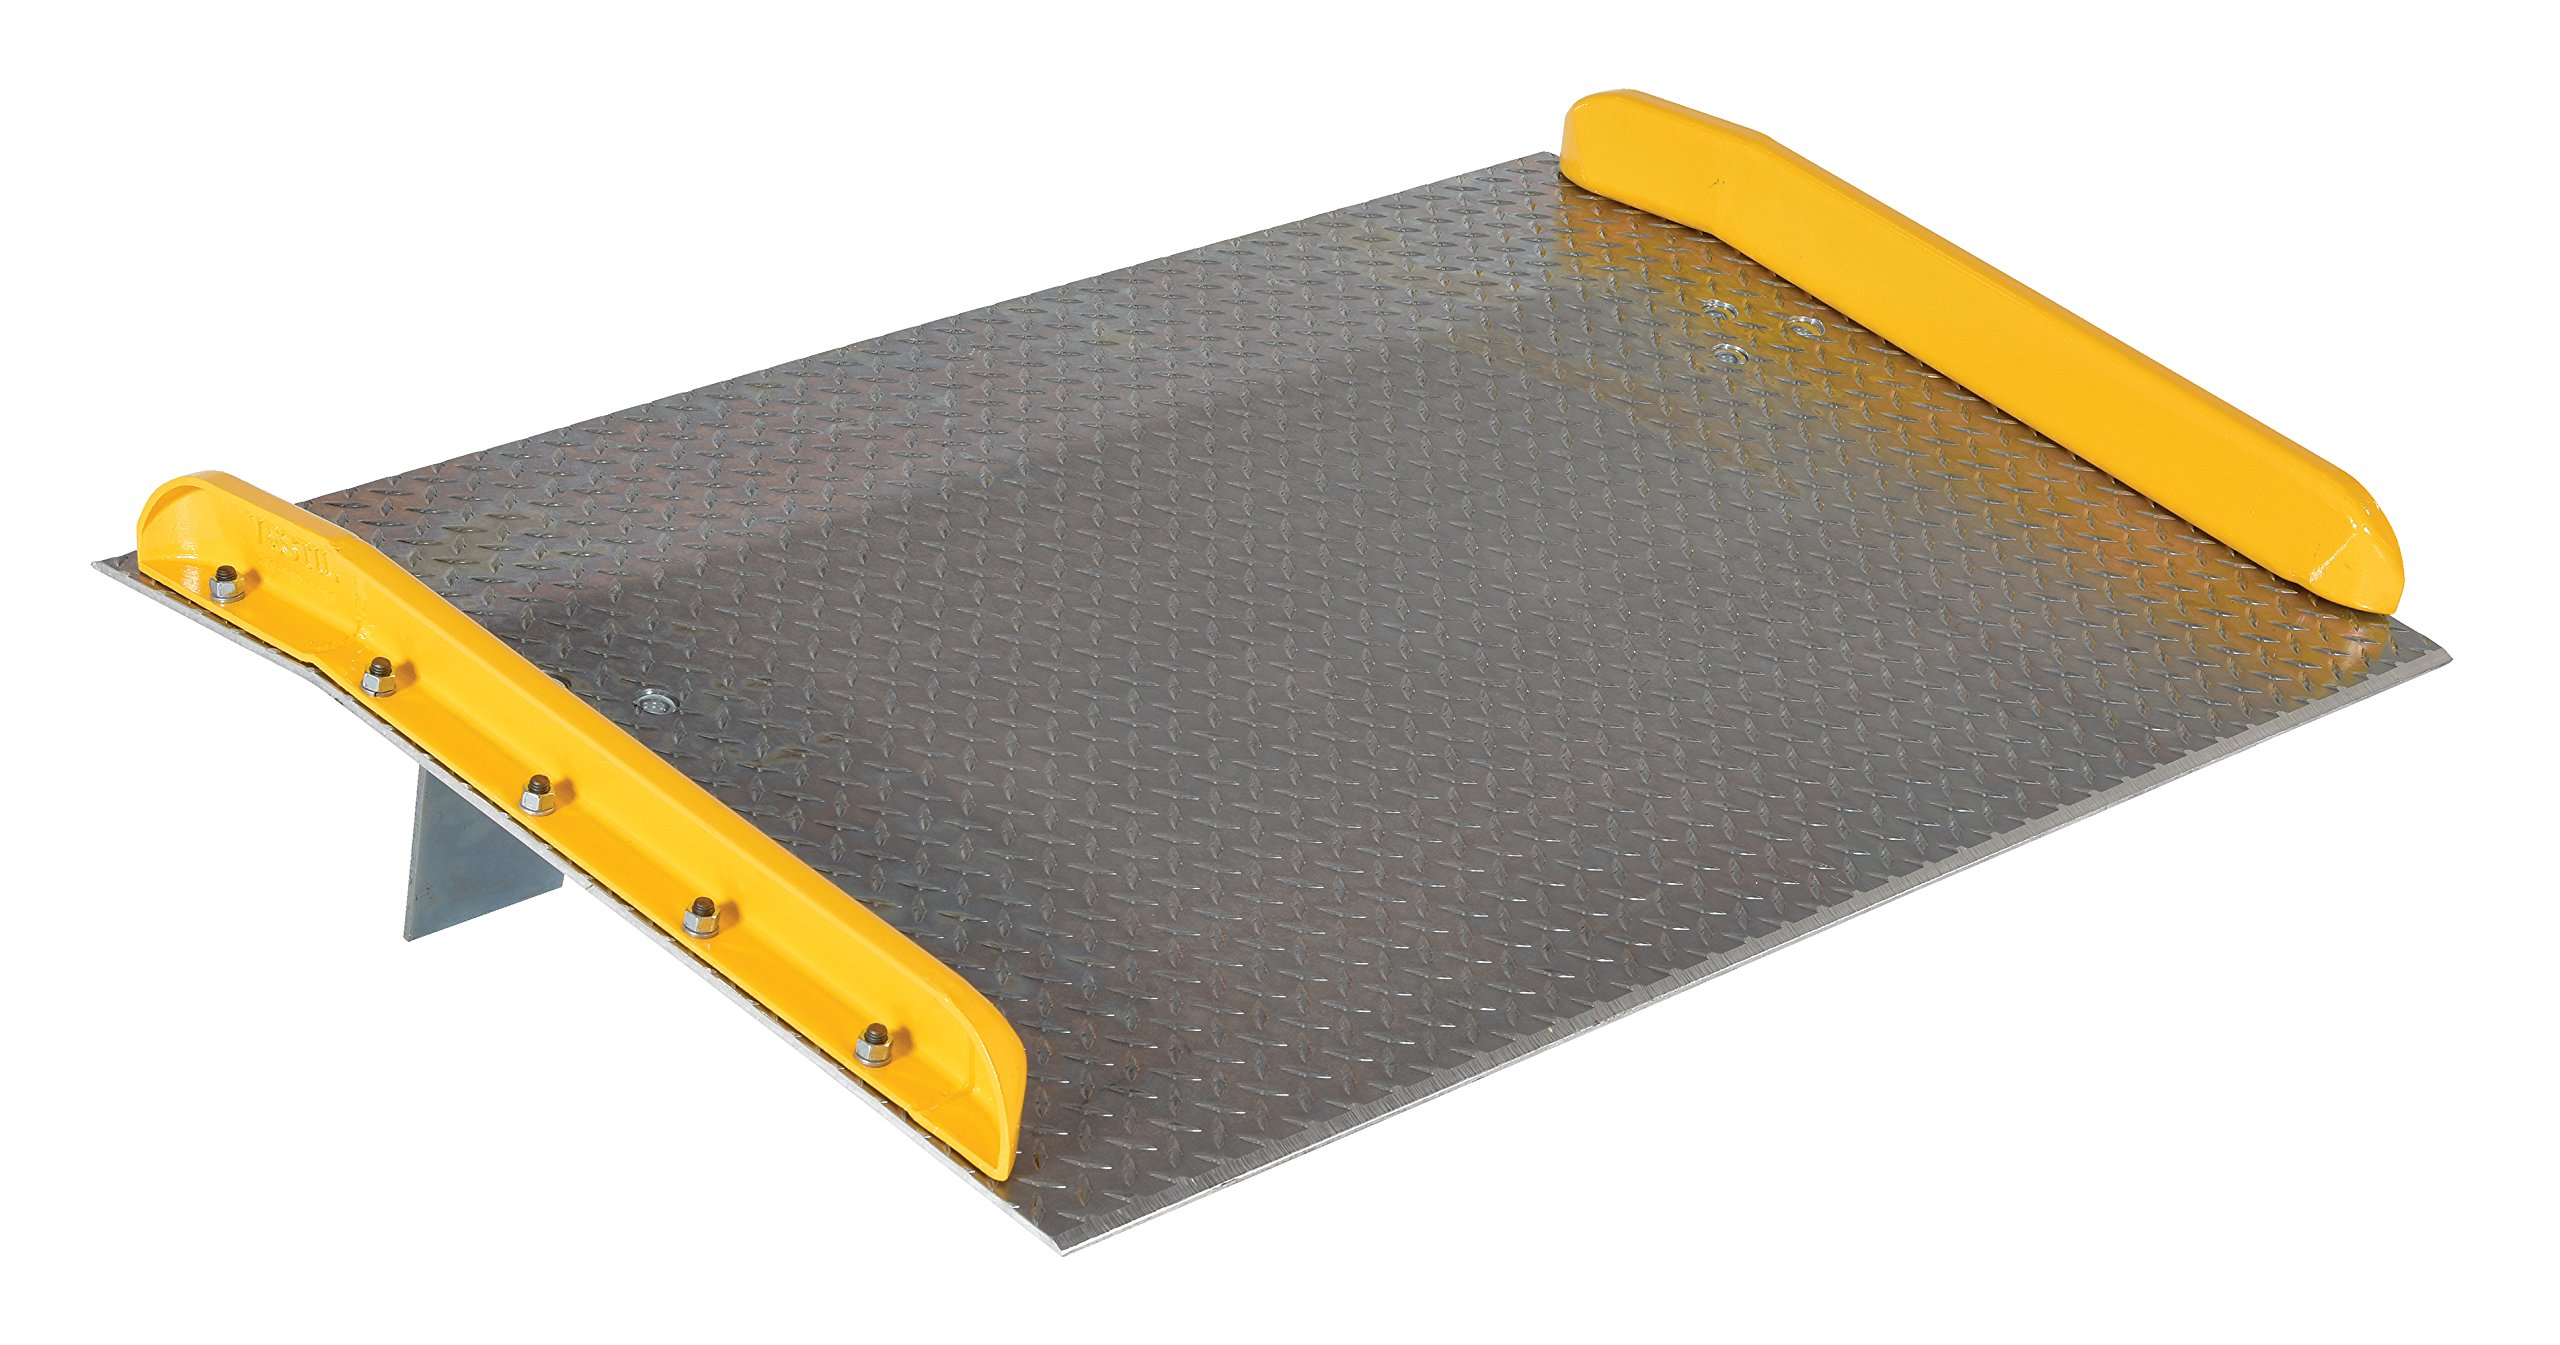 Vestil TAS-10-5436 Aluminum Dock Board with Steel Curb, 10000 lb. Capacity, 54'' x 36'', Silver